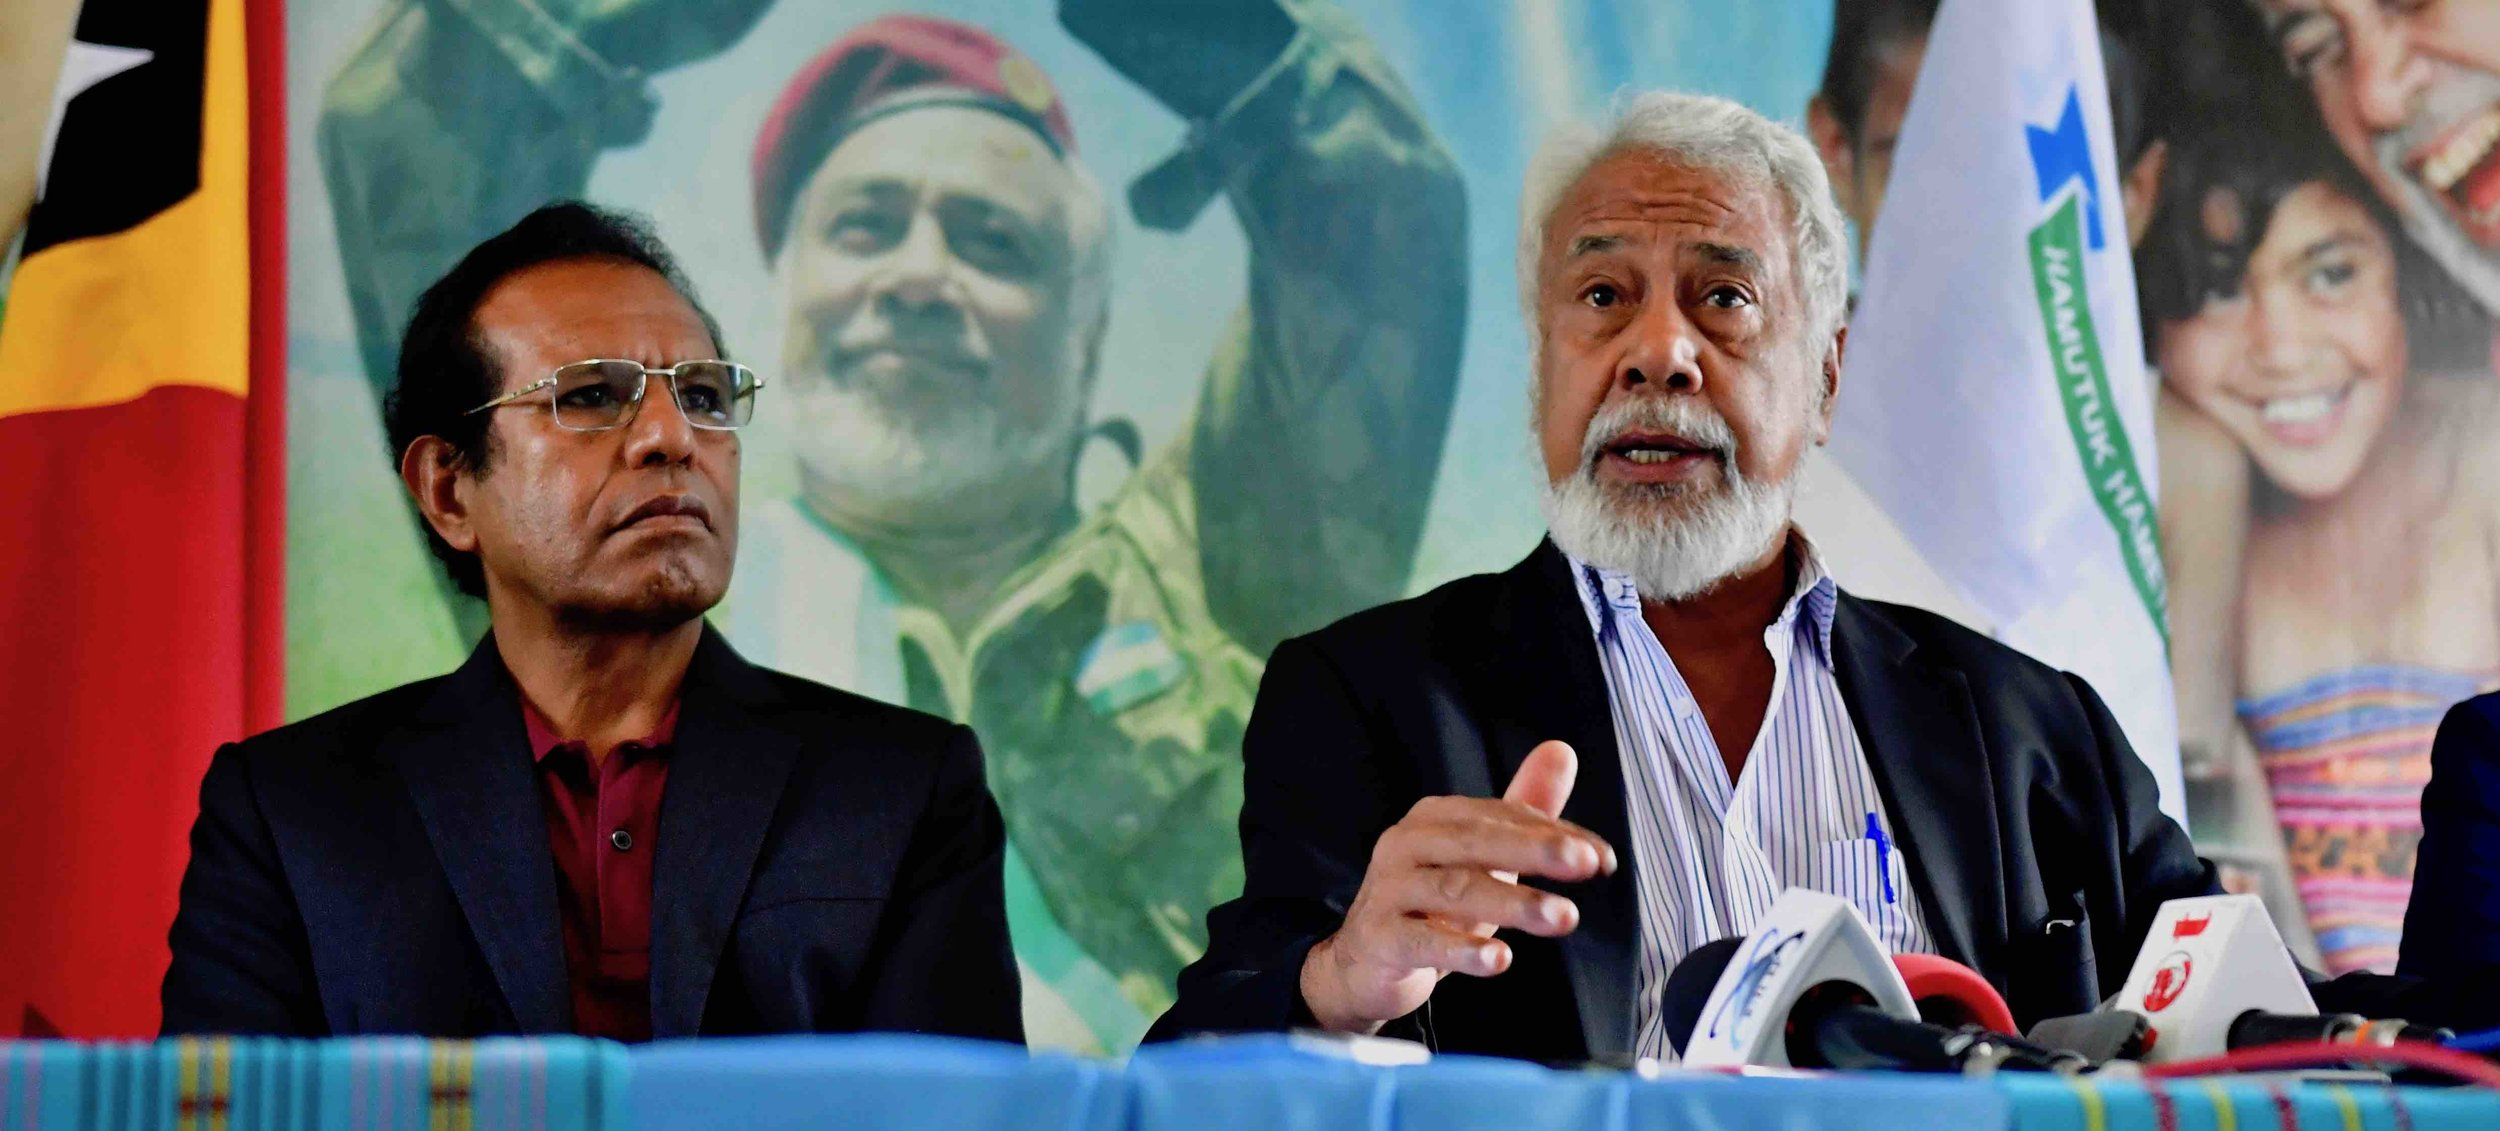 Timor-Leste election: The generation gap